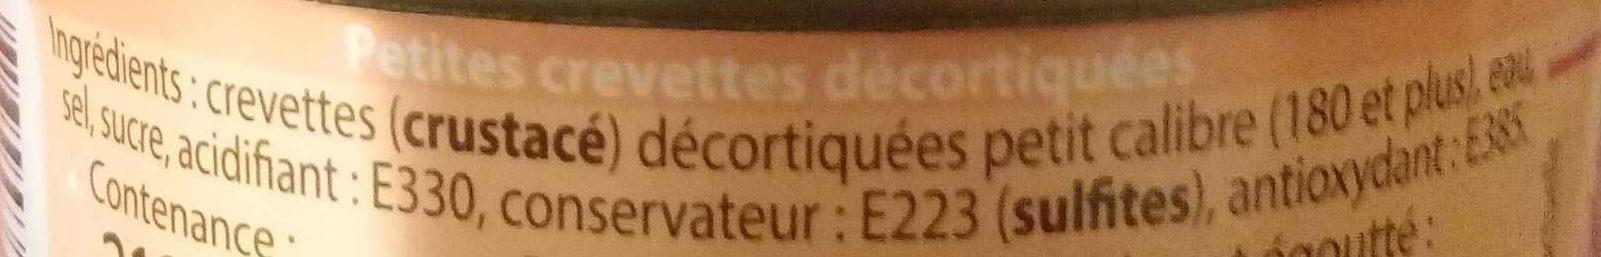 Crevettes Picnic - Ingredients - fr